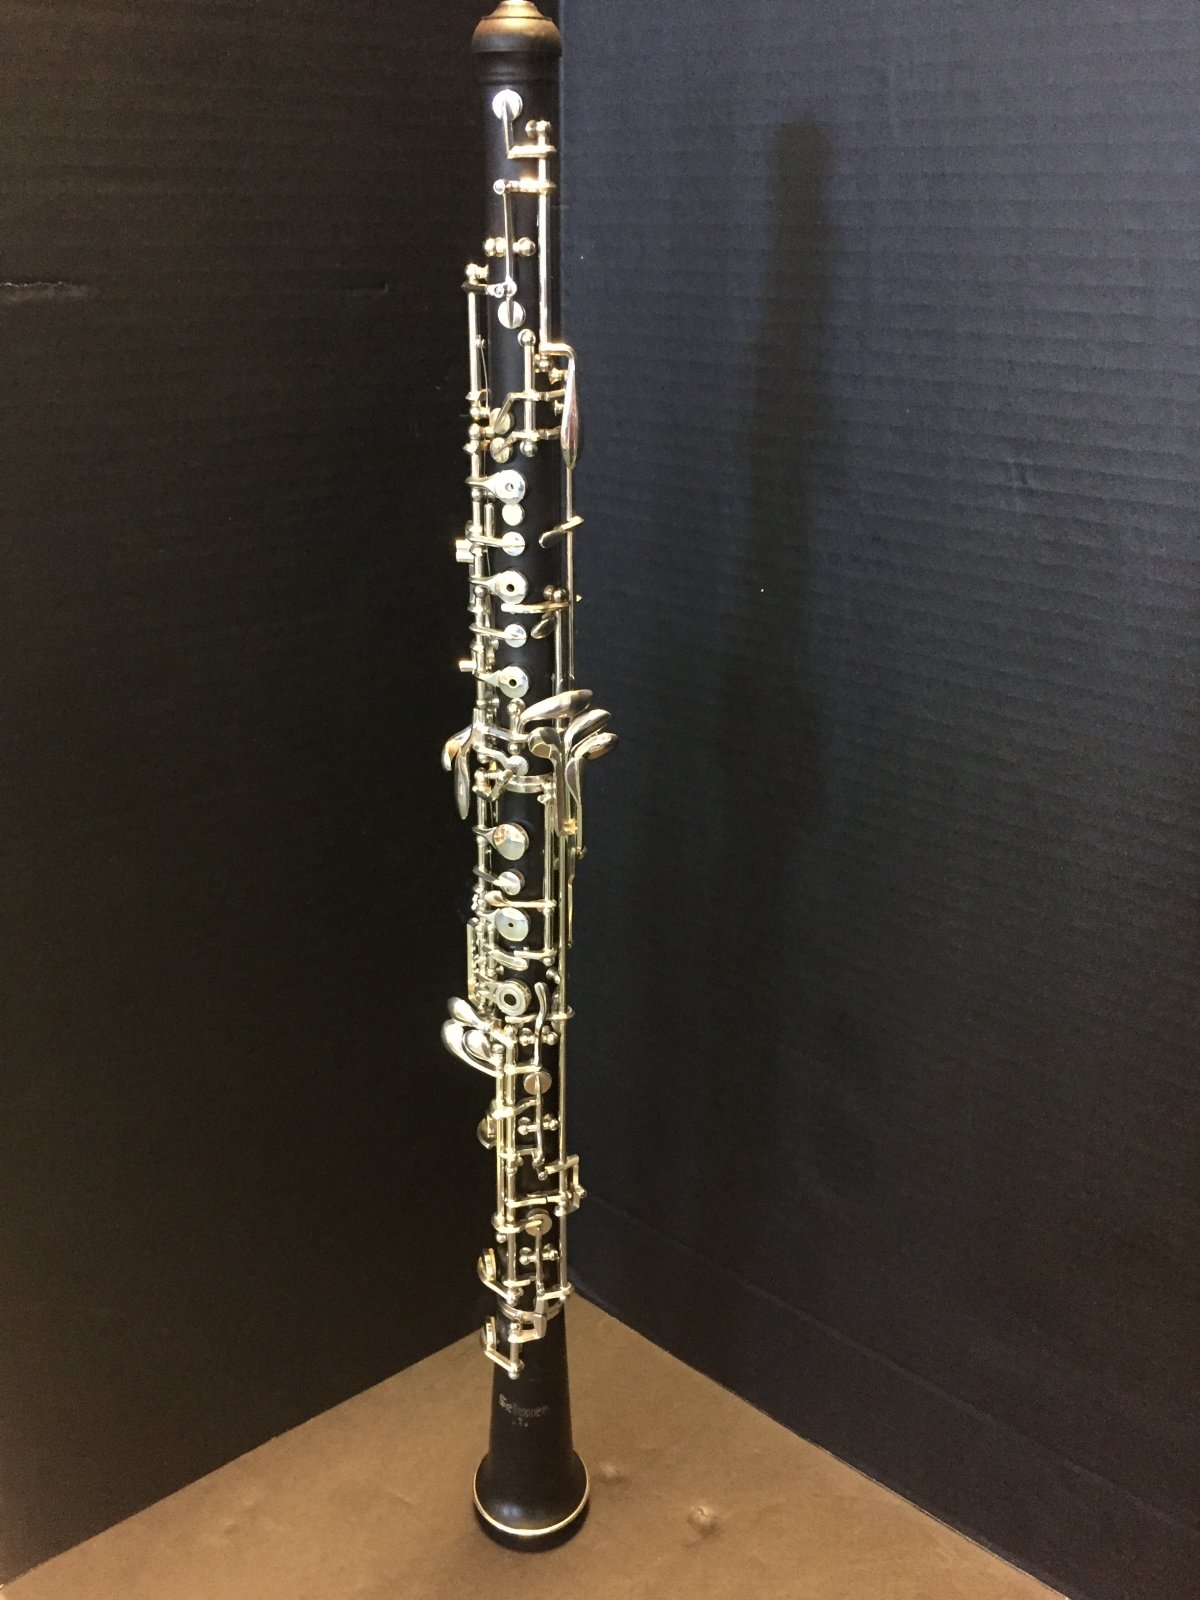 Selmer 121 Grenadilla Wood Oboe